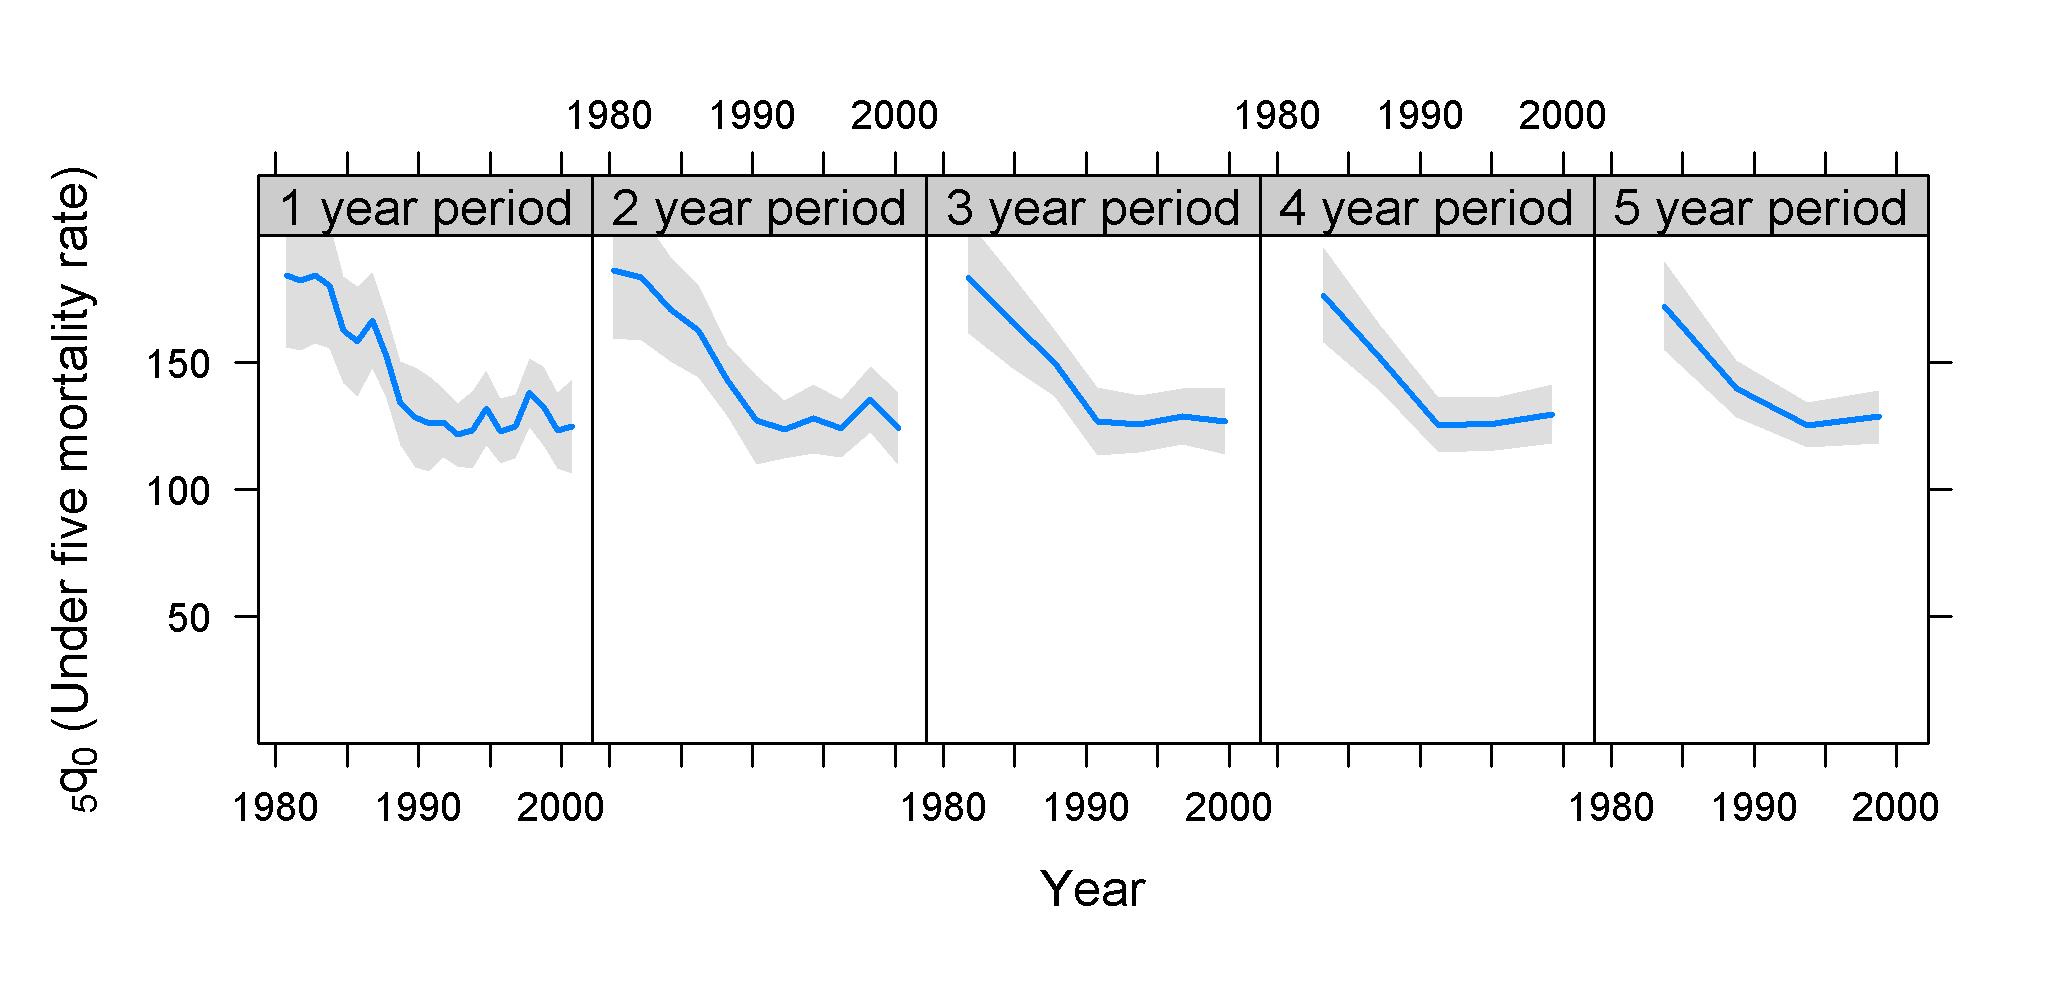 Estimates of <sub>5</sub><i>q</i><sub>0</sub> and confidence intervals for Mali 2001 DHS survey.